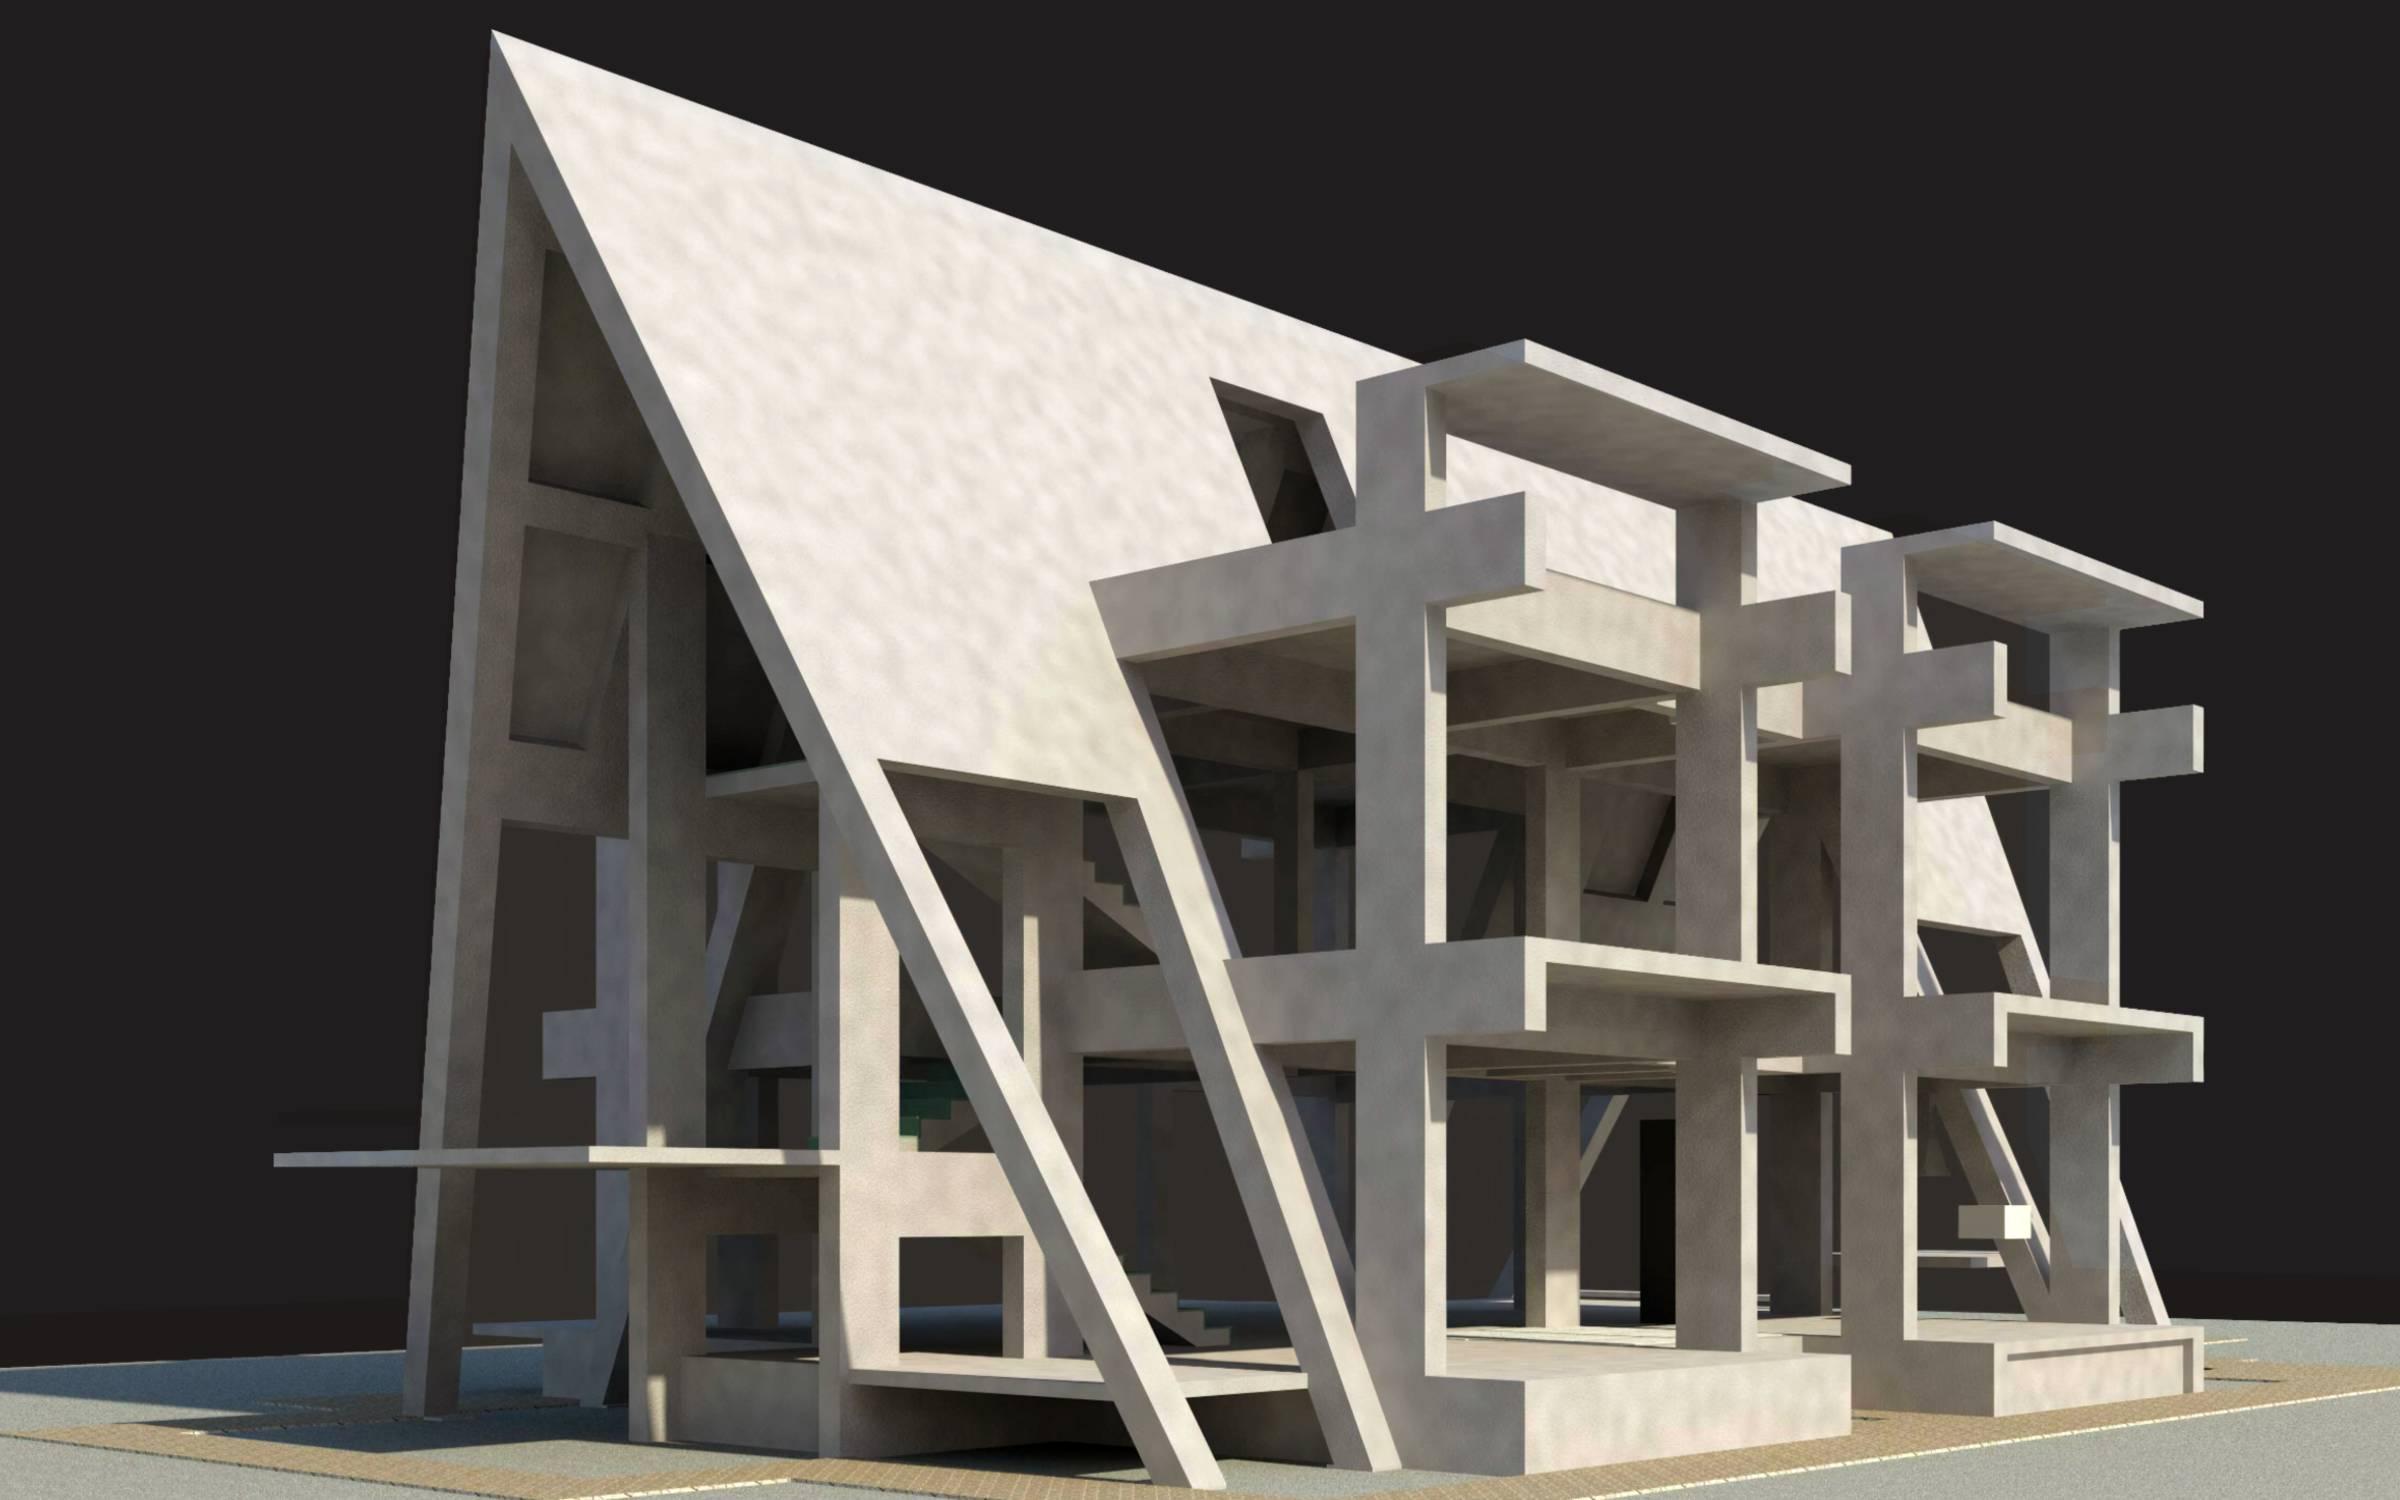 The Villa Structural Framing view